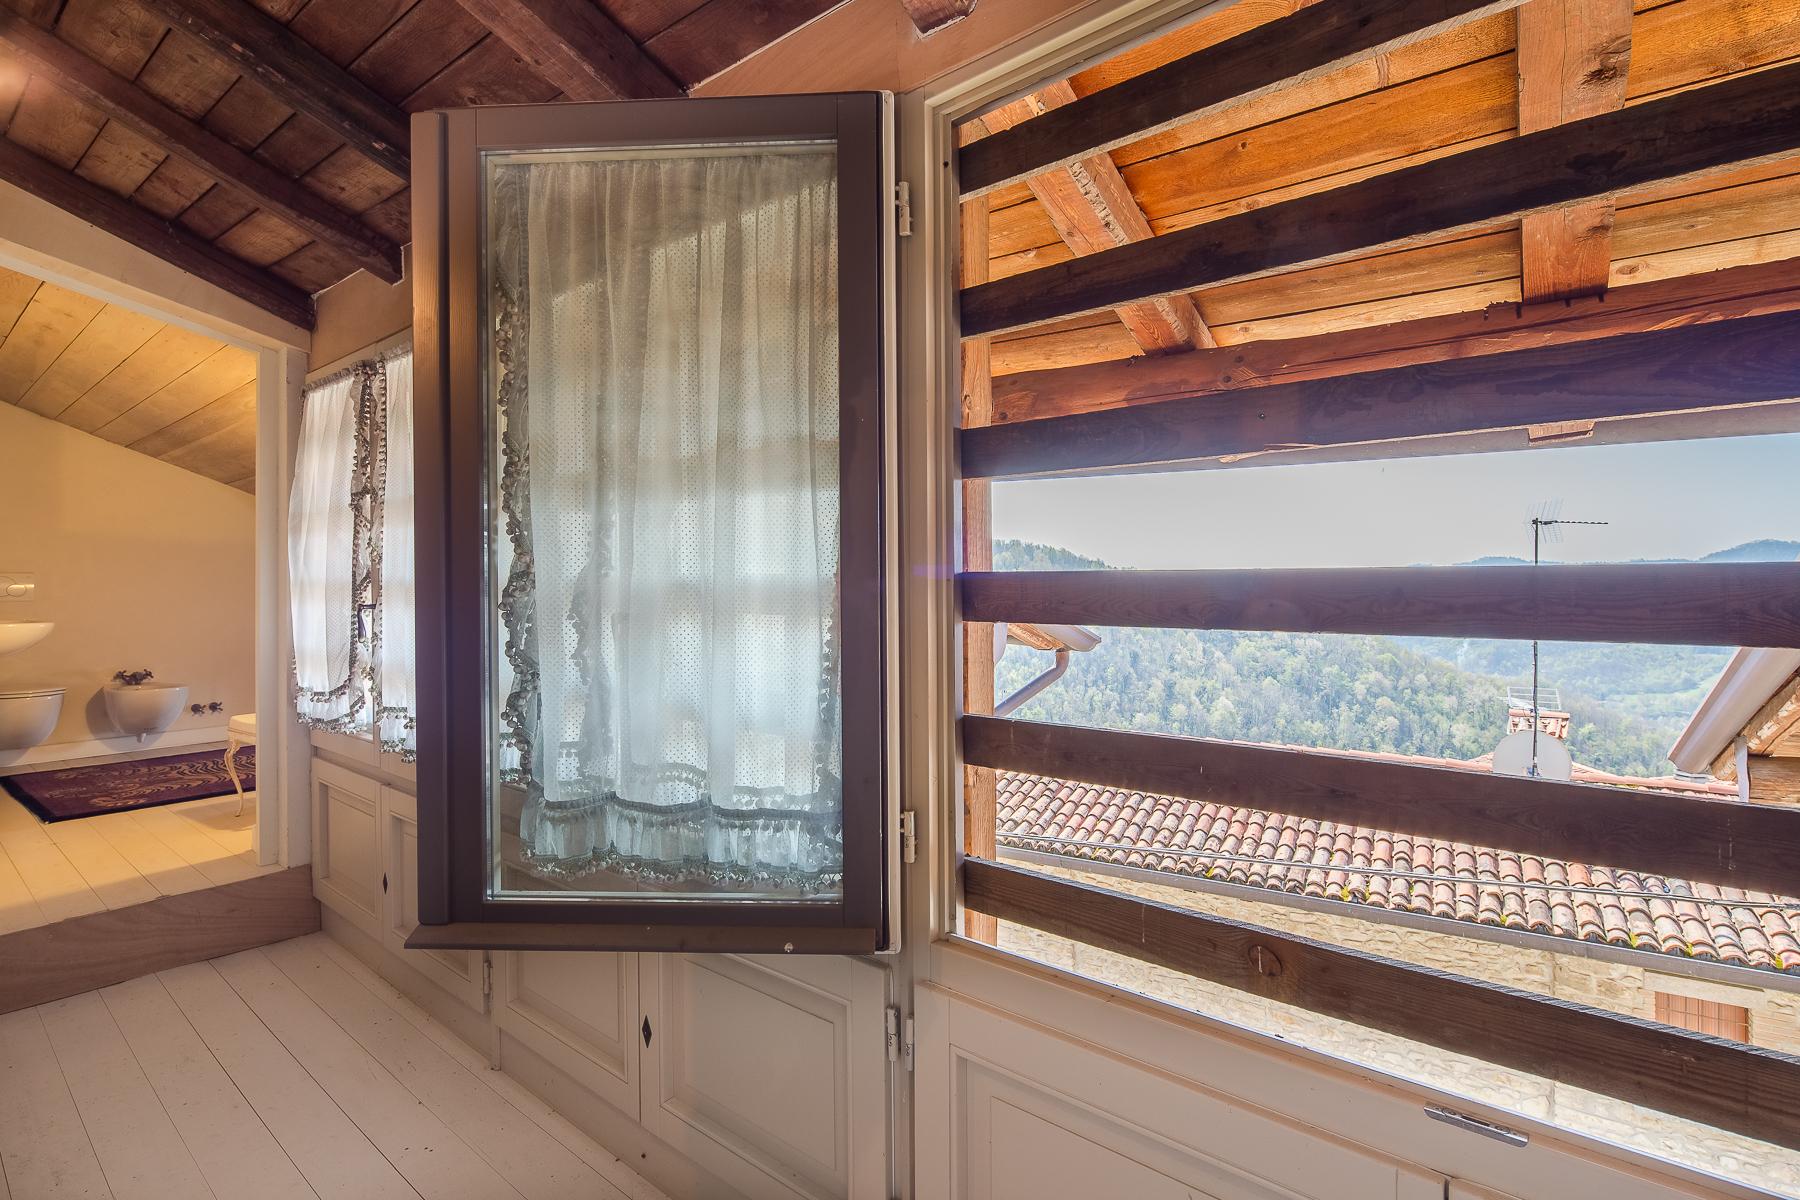 Casa indipendente in Vendita a Caprino Bergamasco: 5 locali, 500 mq - Foto 9